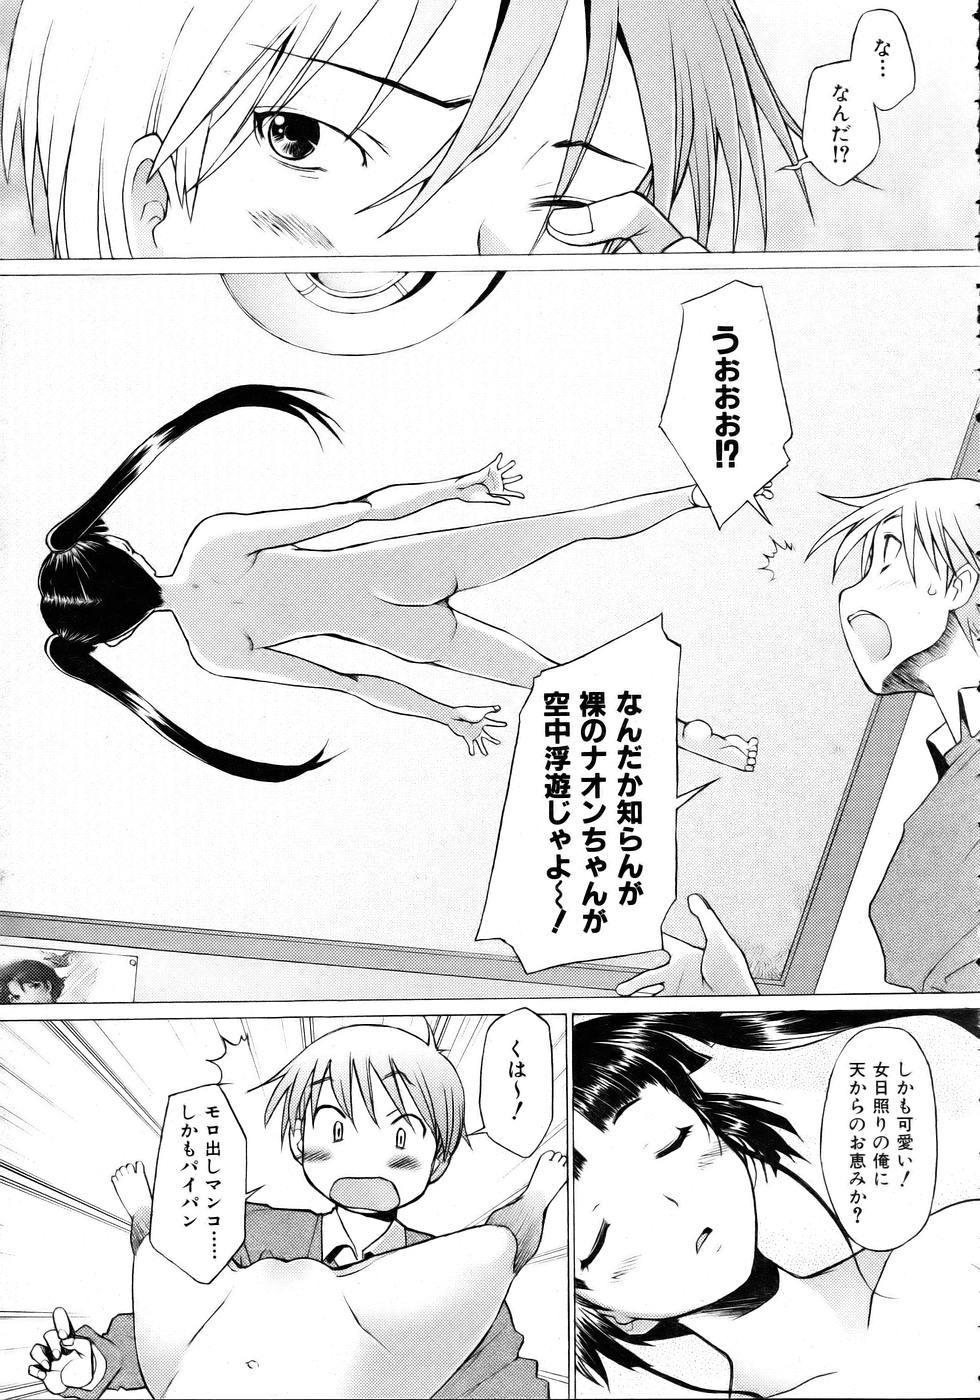 COMIC AUN 2005-12 Vol. 115 168